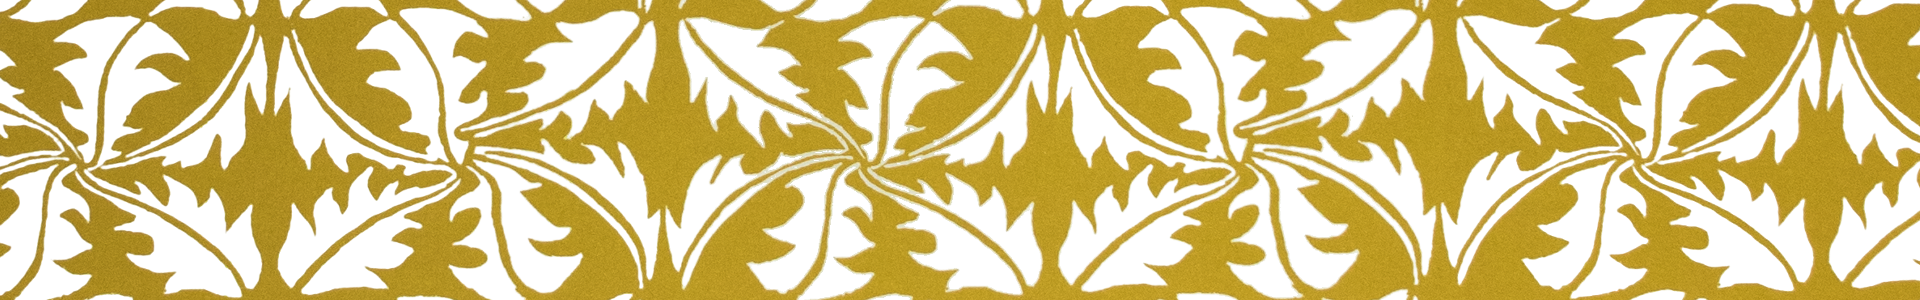 Banner-Images-3_0003_dandelion-yellow